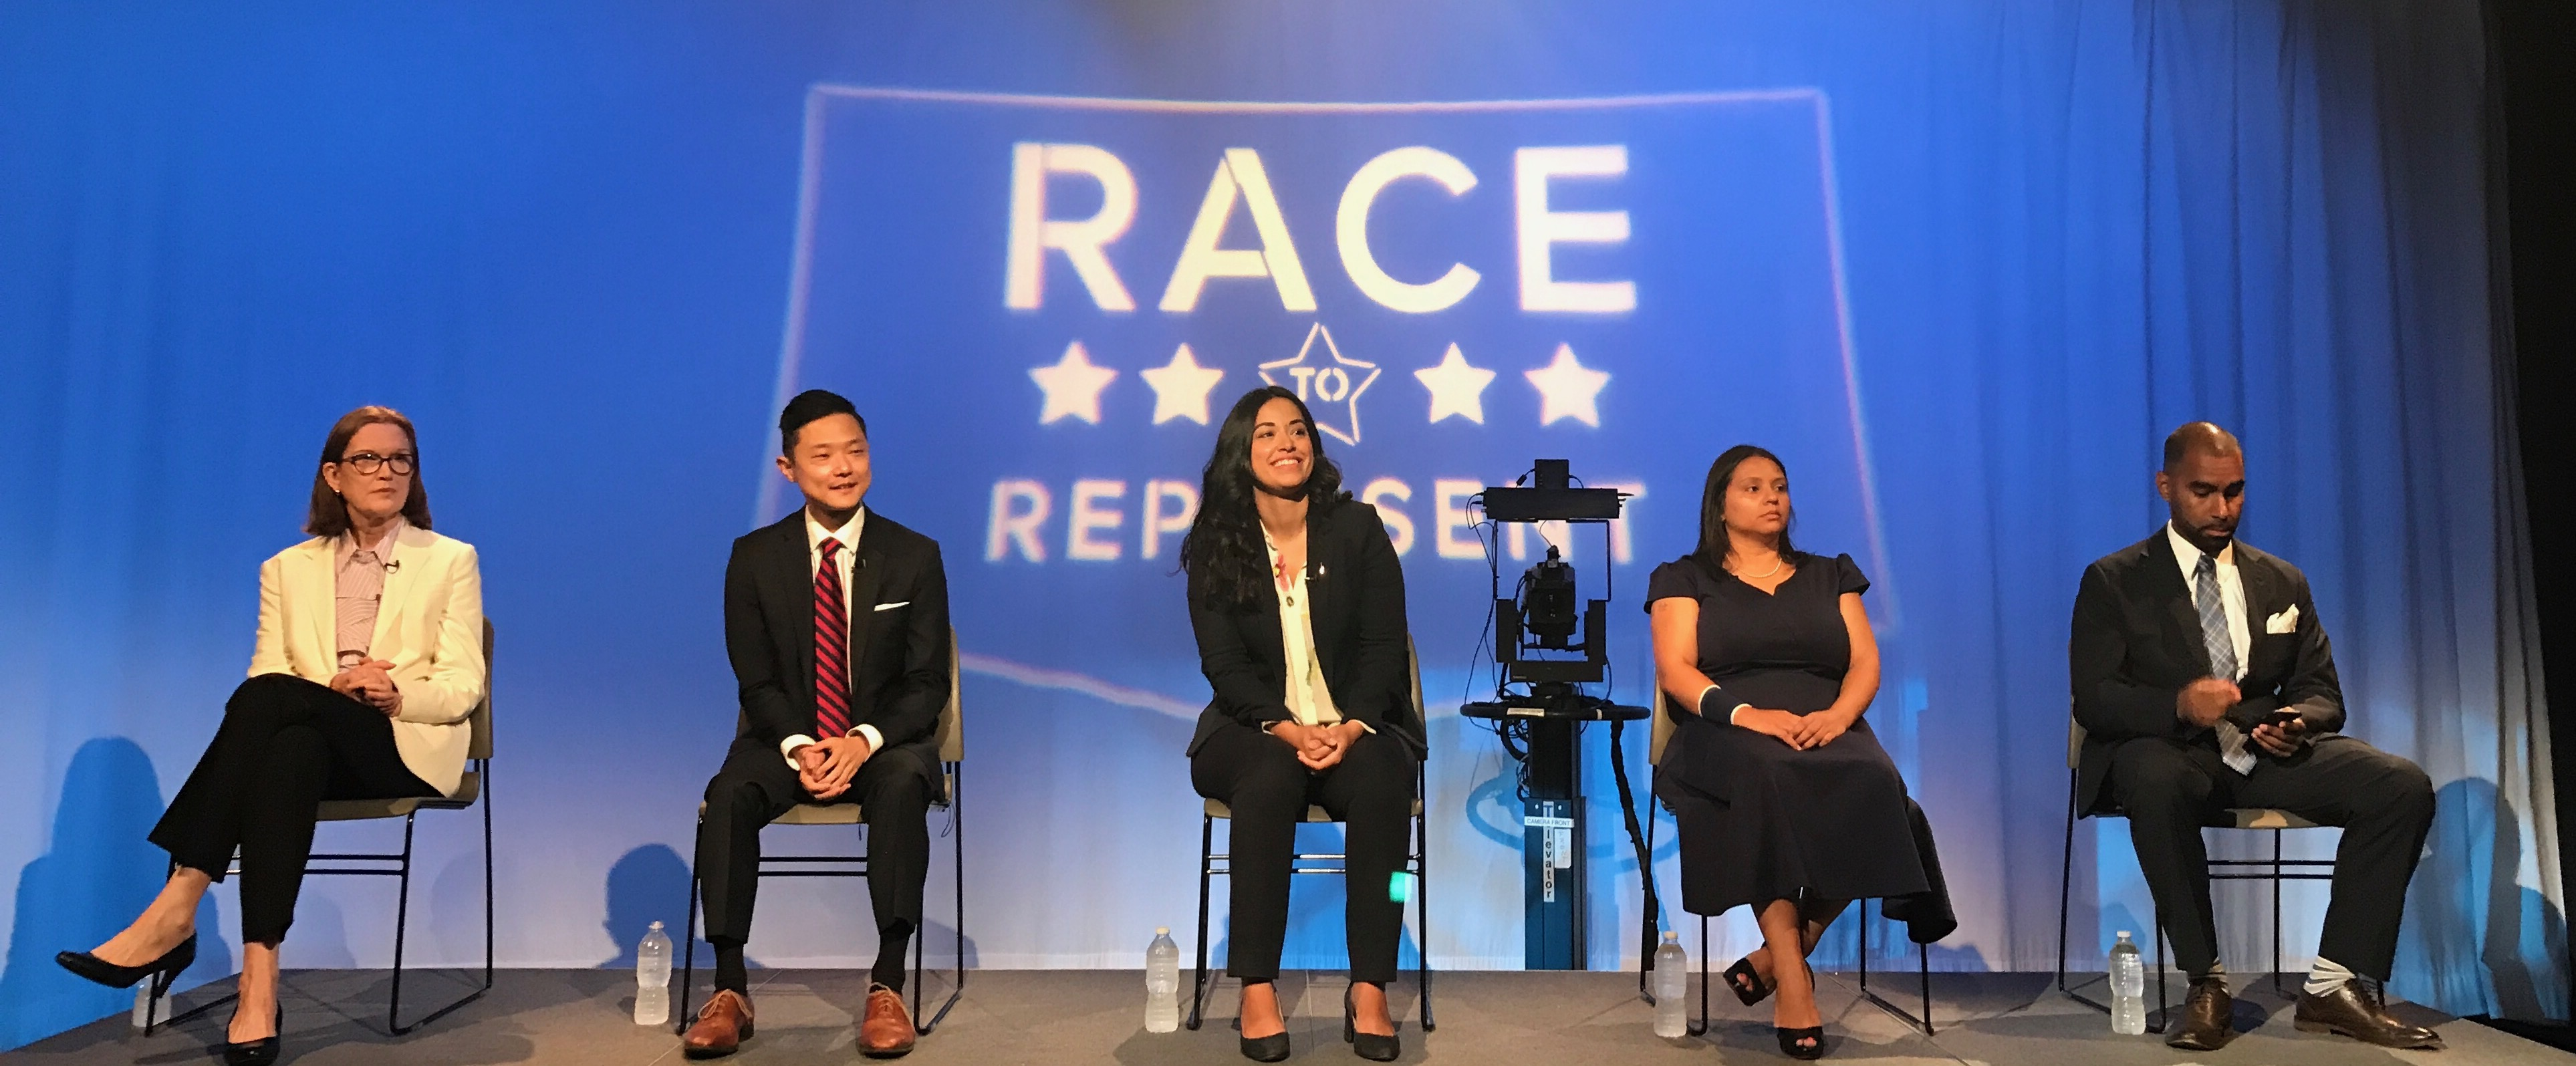 City Council District 2 candidates